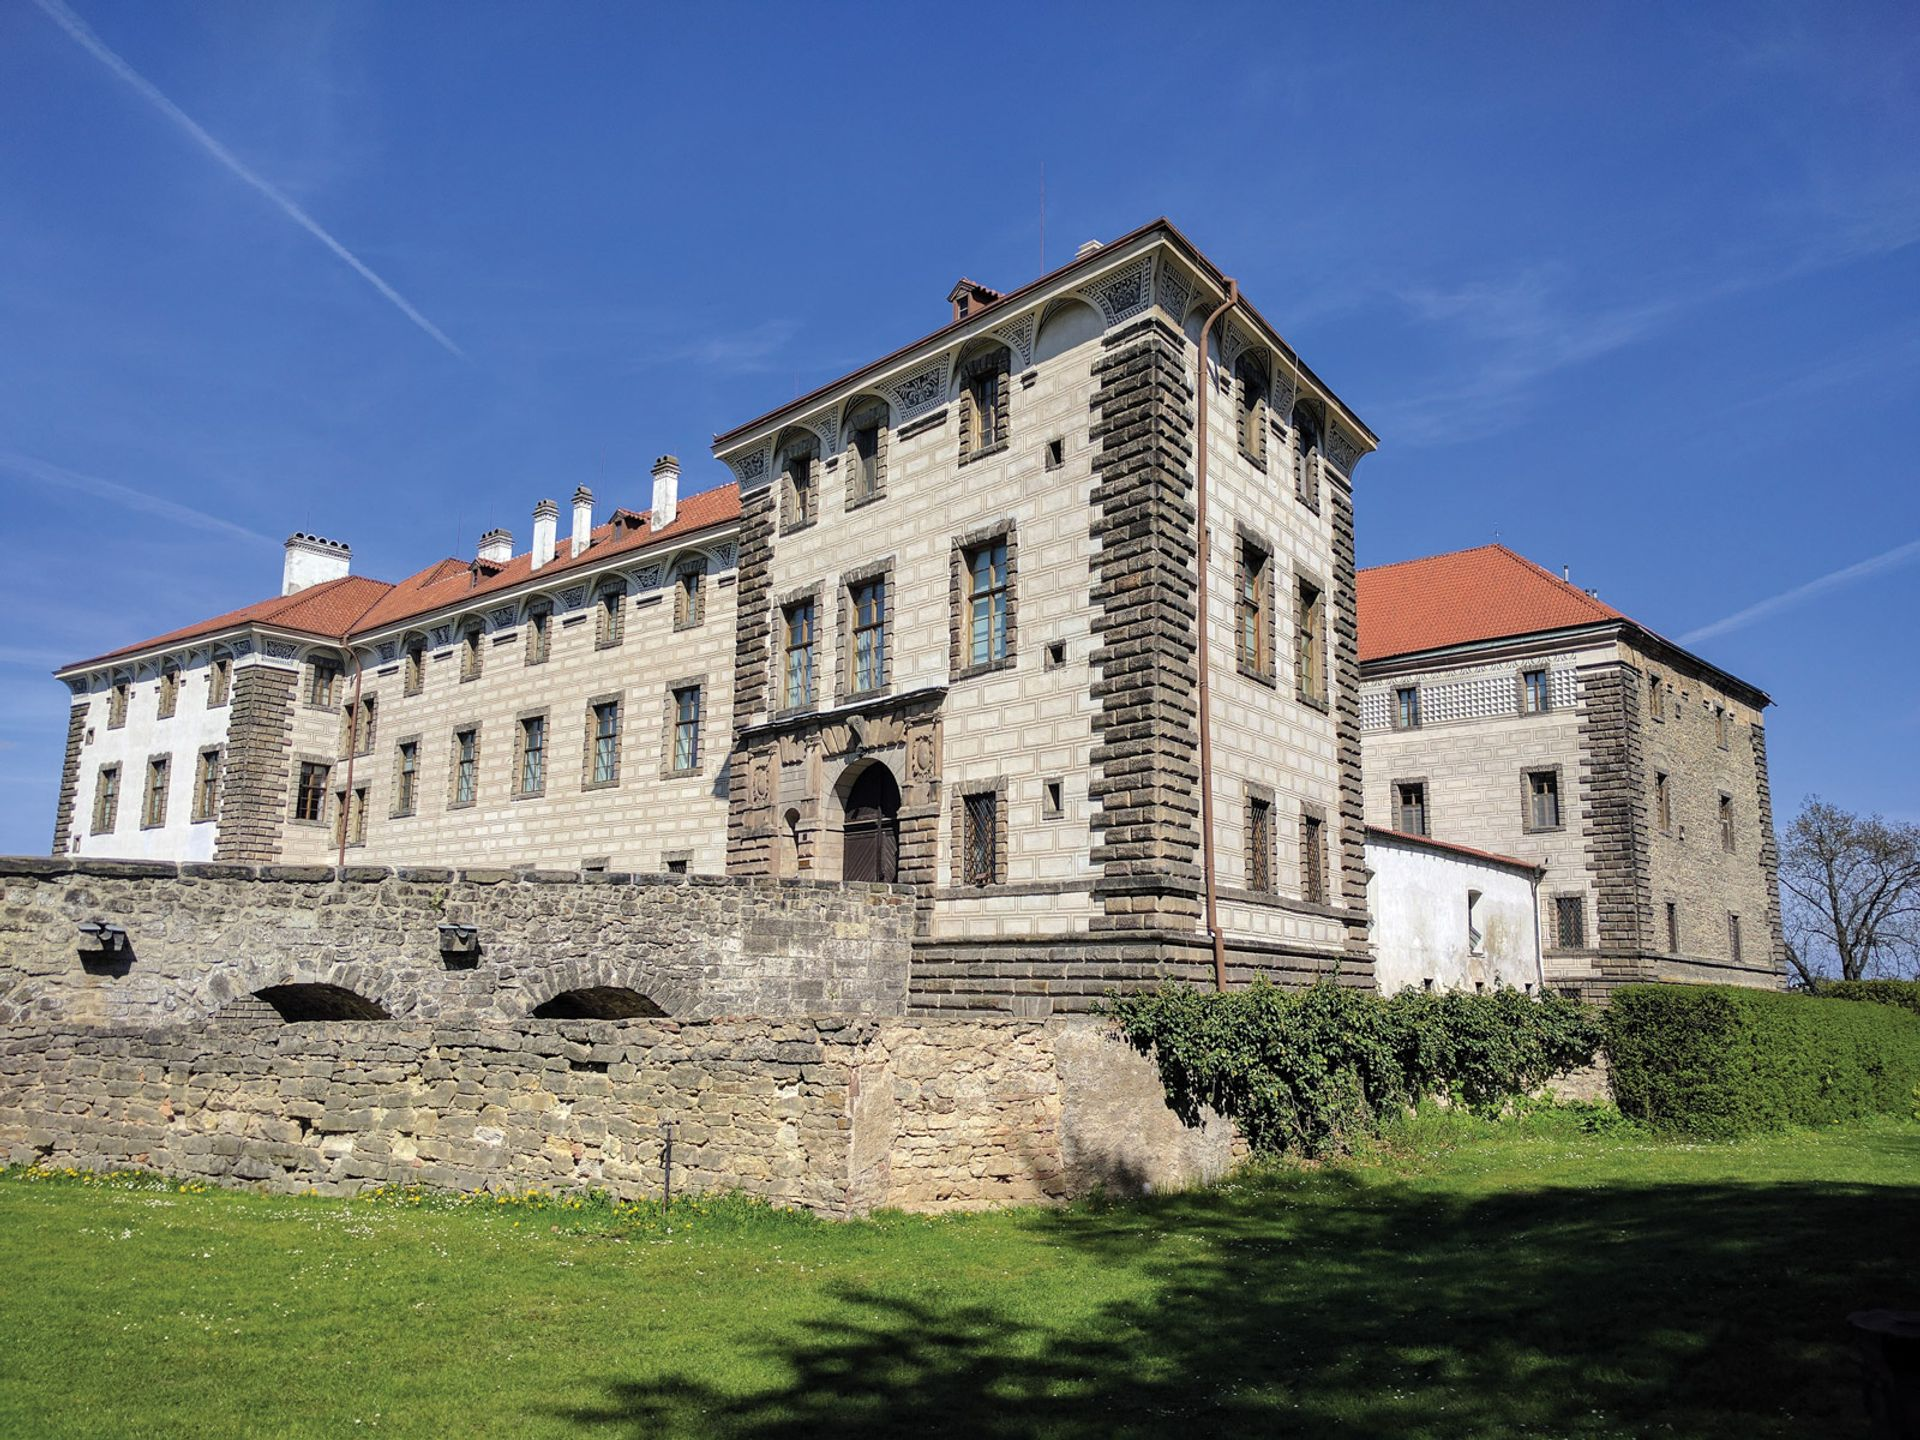 Grand design: Nelahozeves Castle near Prague